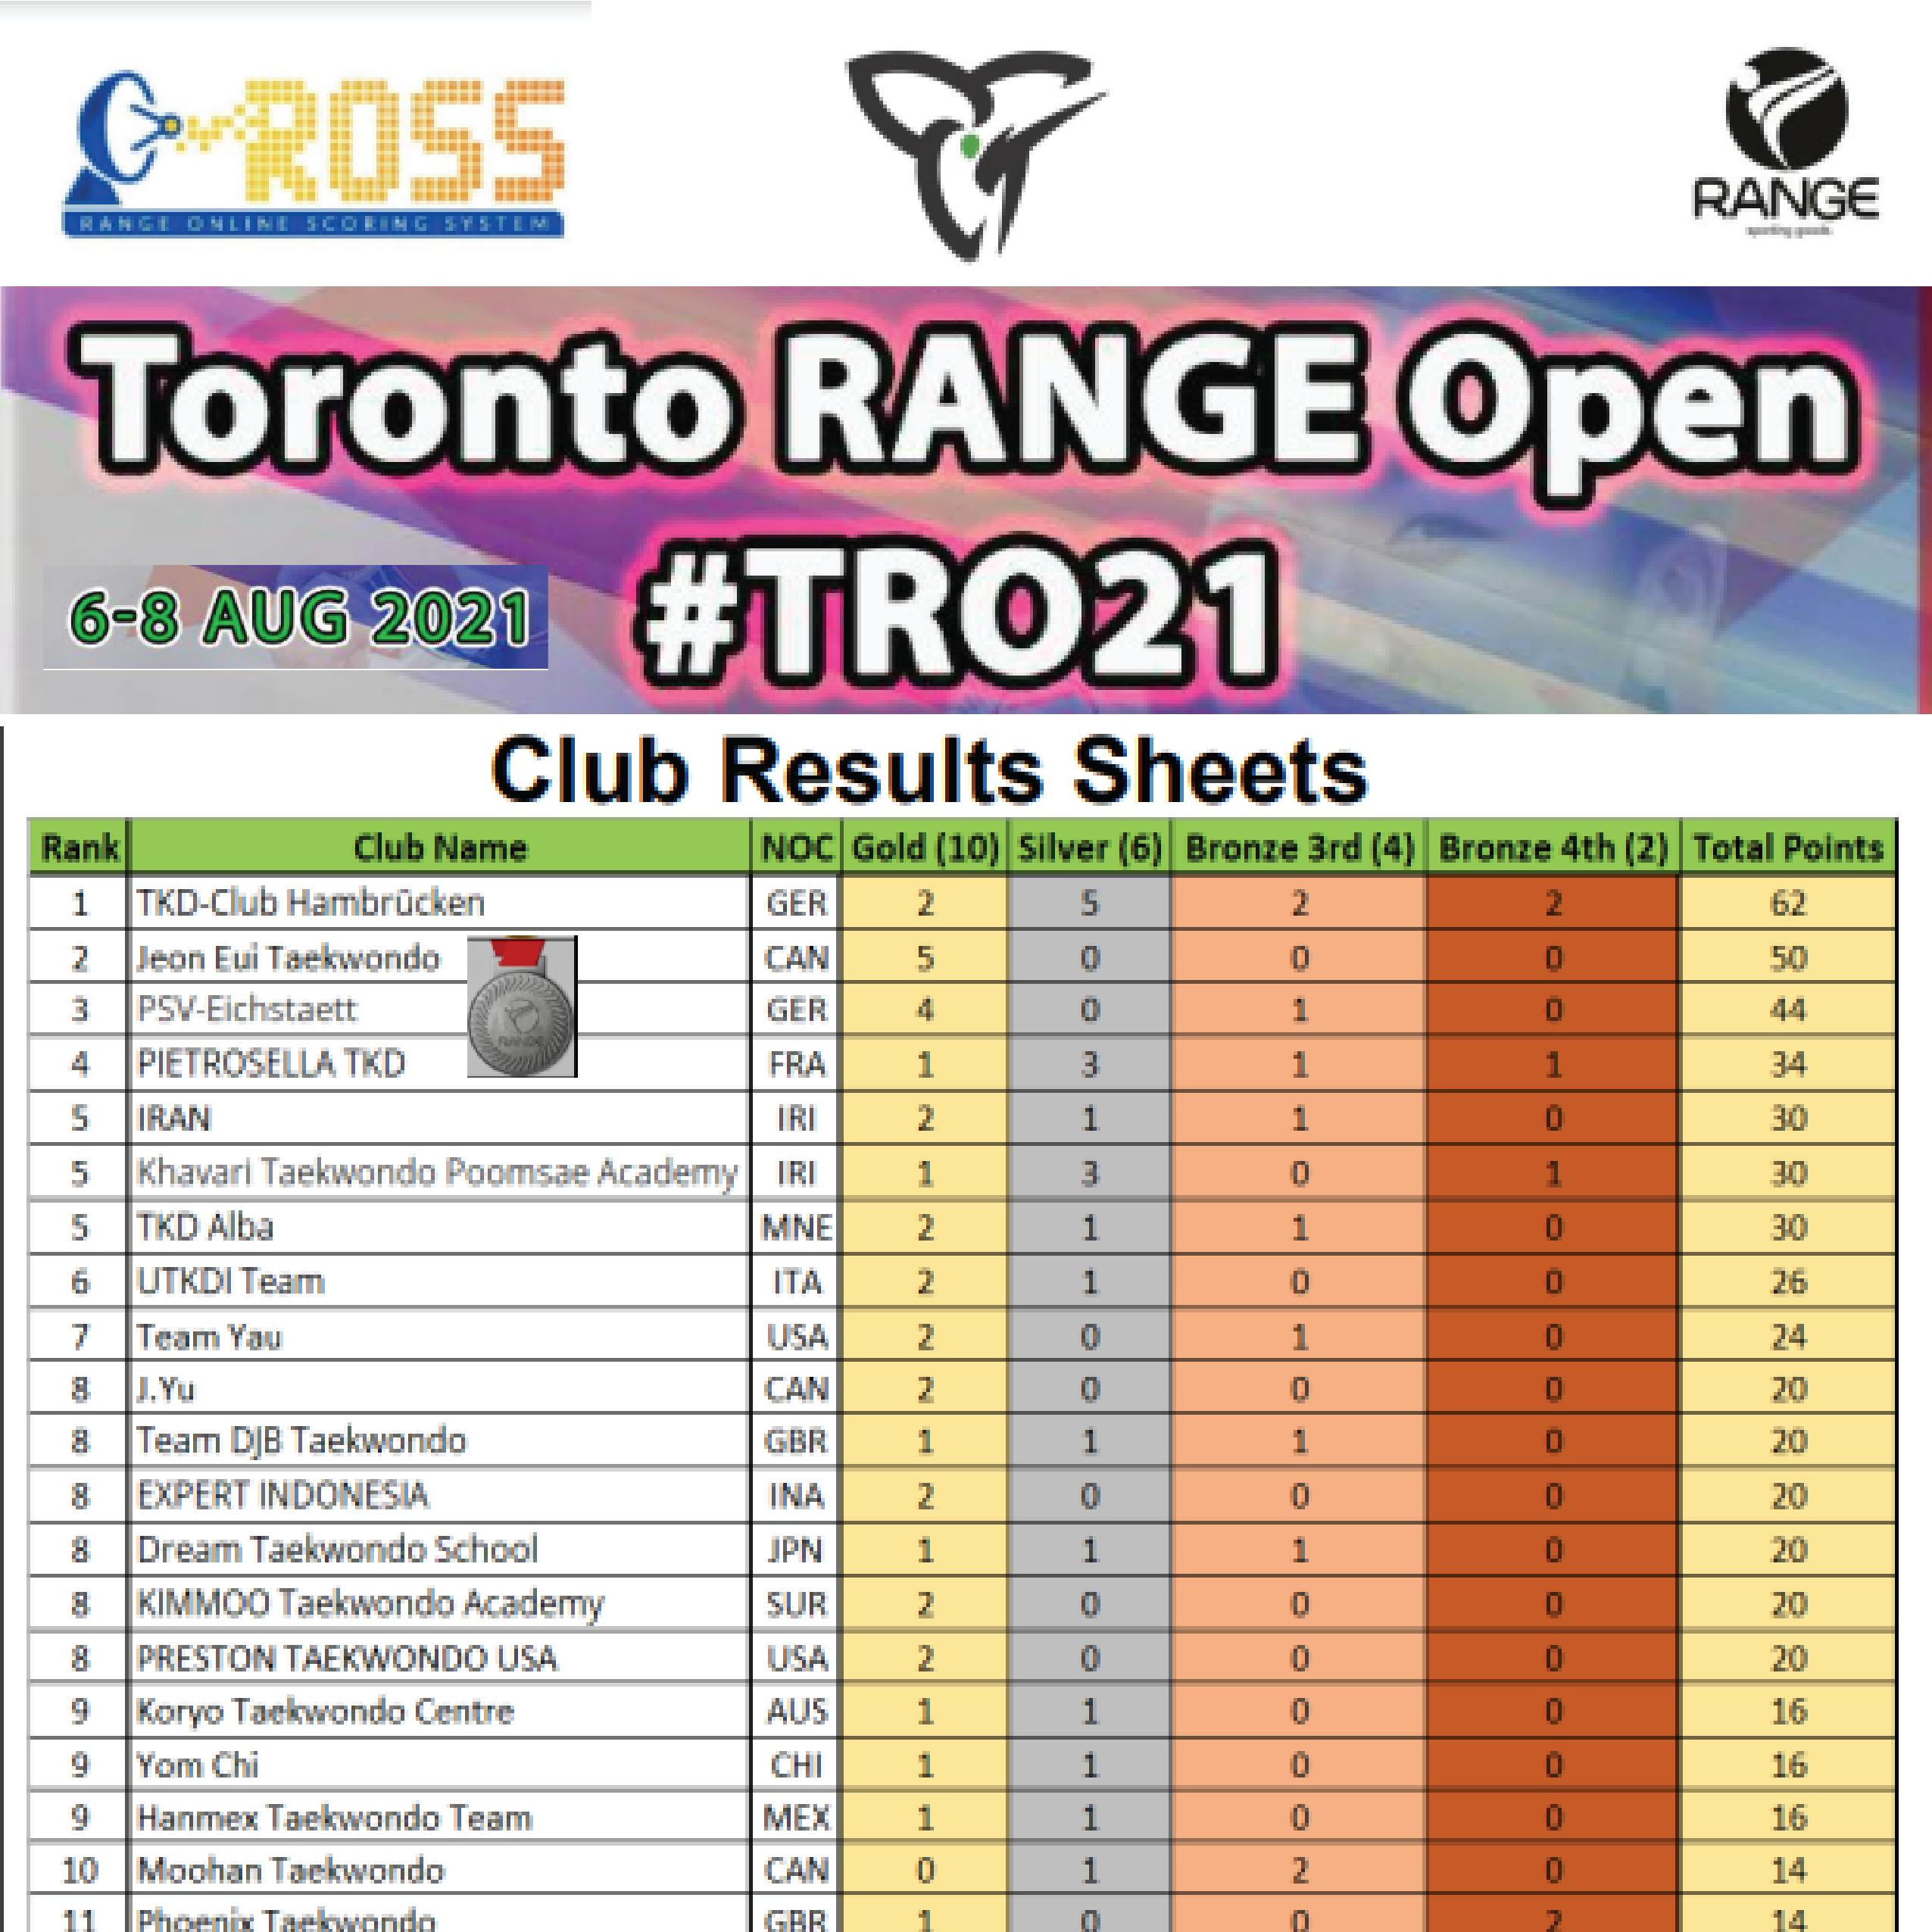 Toronto Range Online First Edition (Canada)